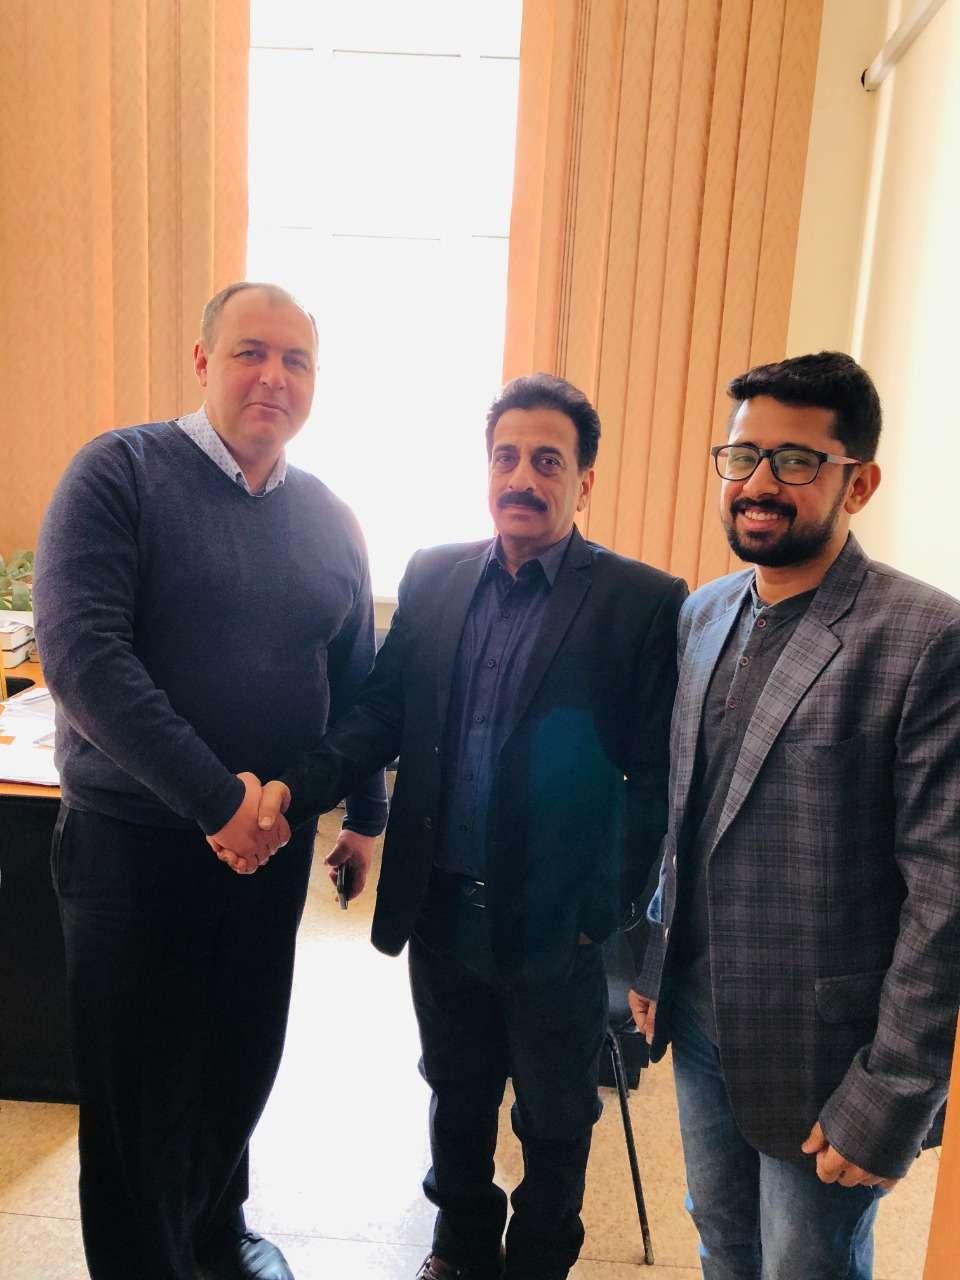 Pradeep Jayaswal & Shobhit Jayaswal of GMF with the Vice-Chancellor of Vinnitsa National Medical University, Ukraine.